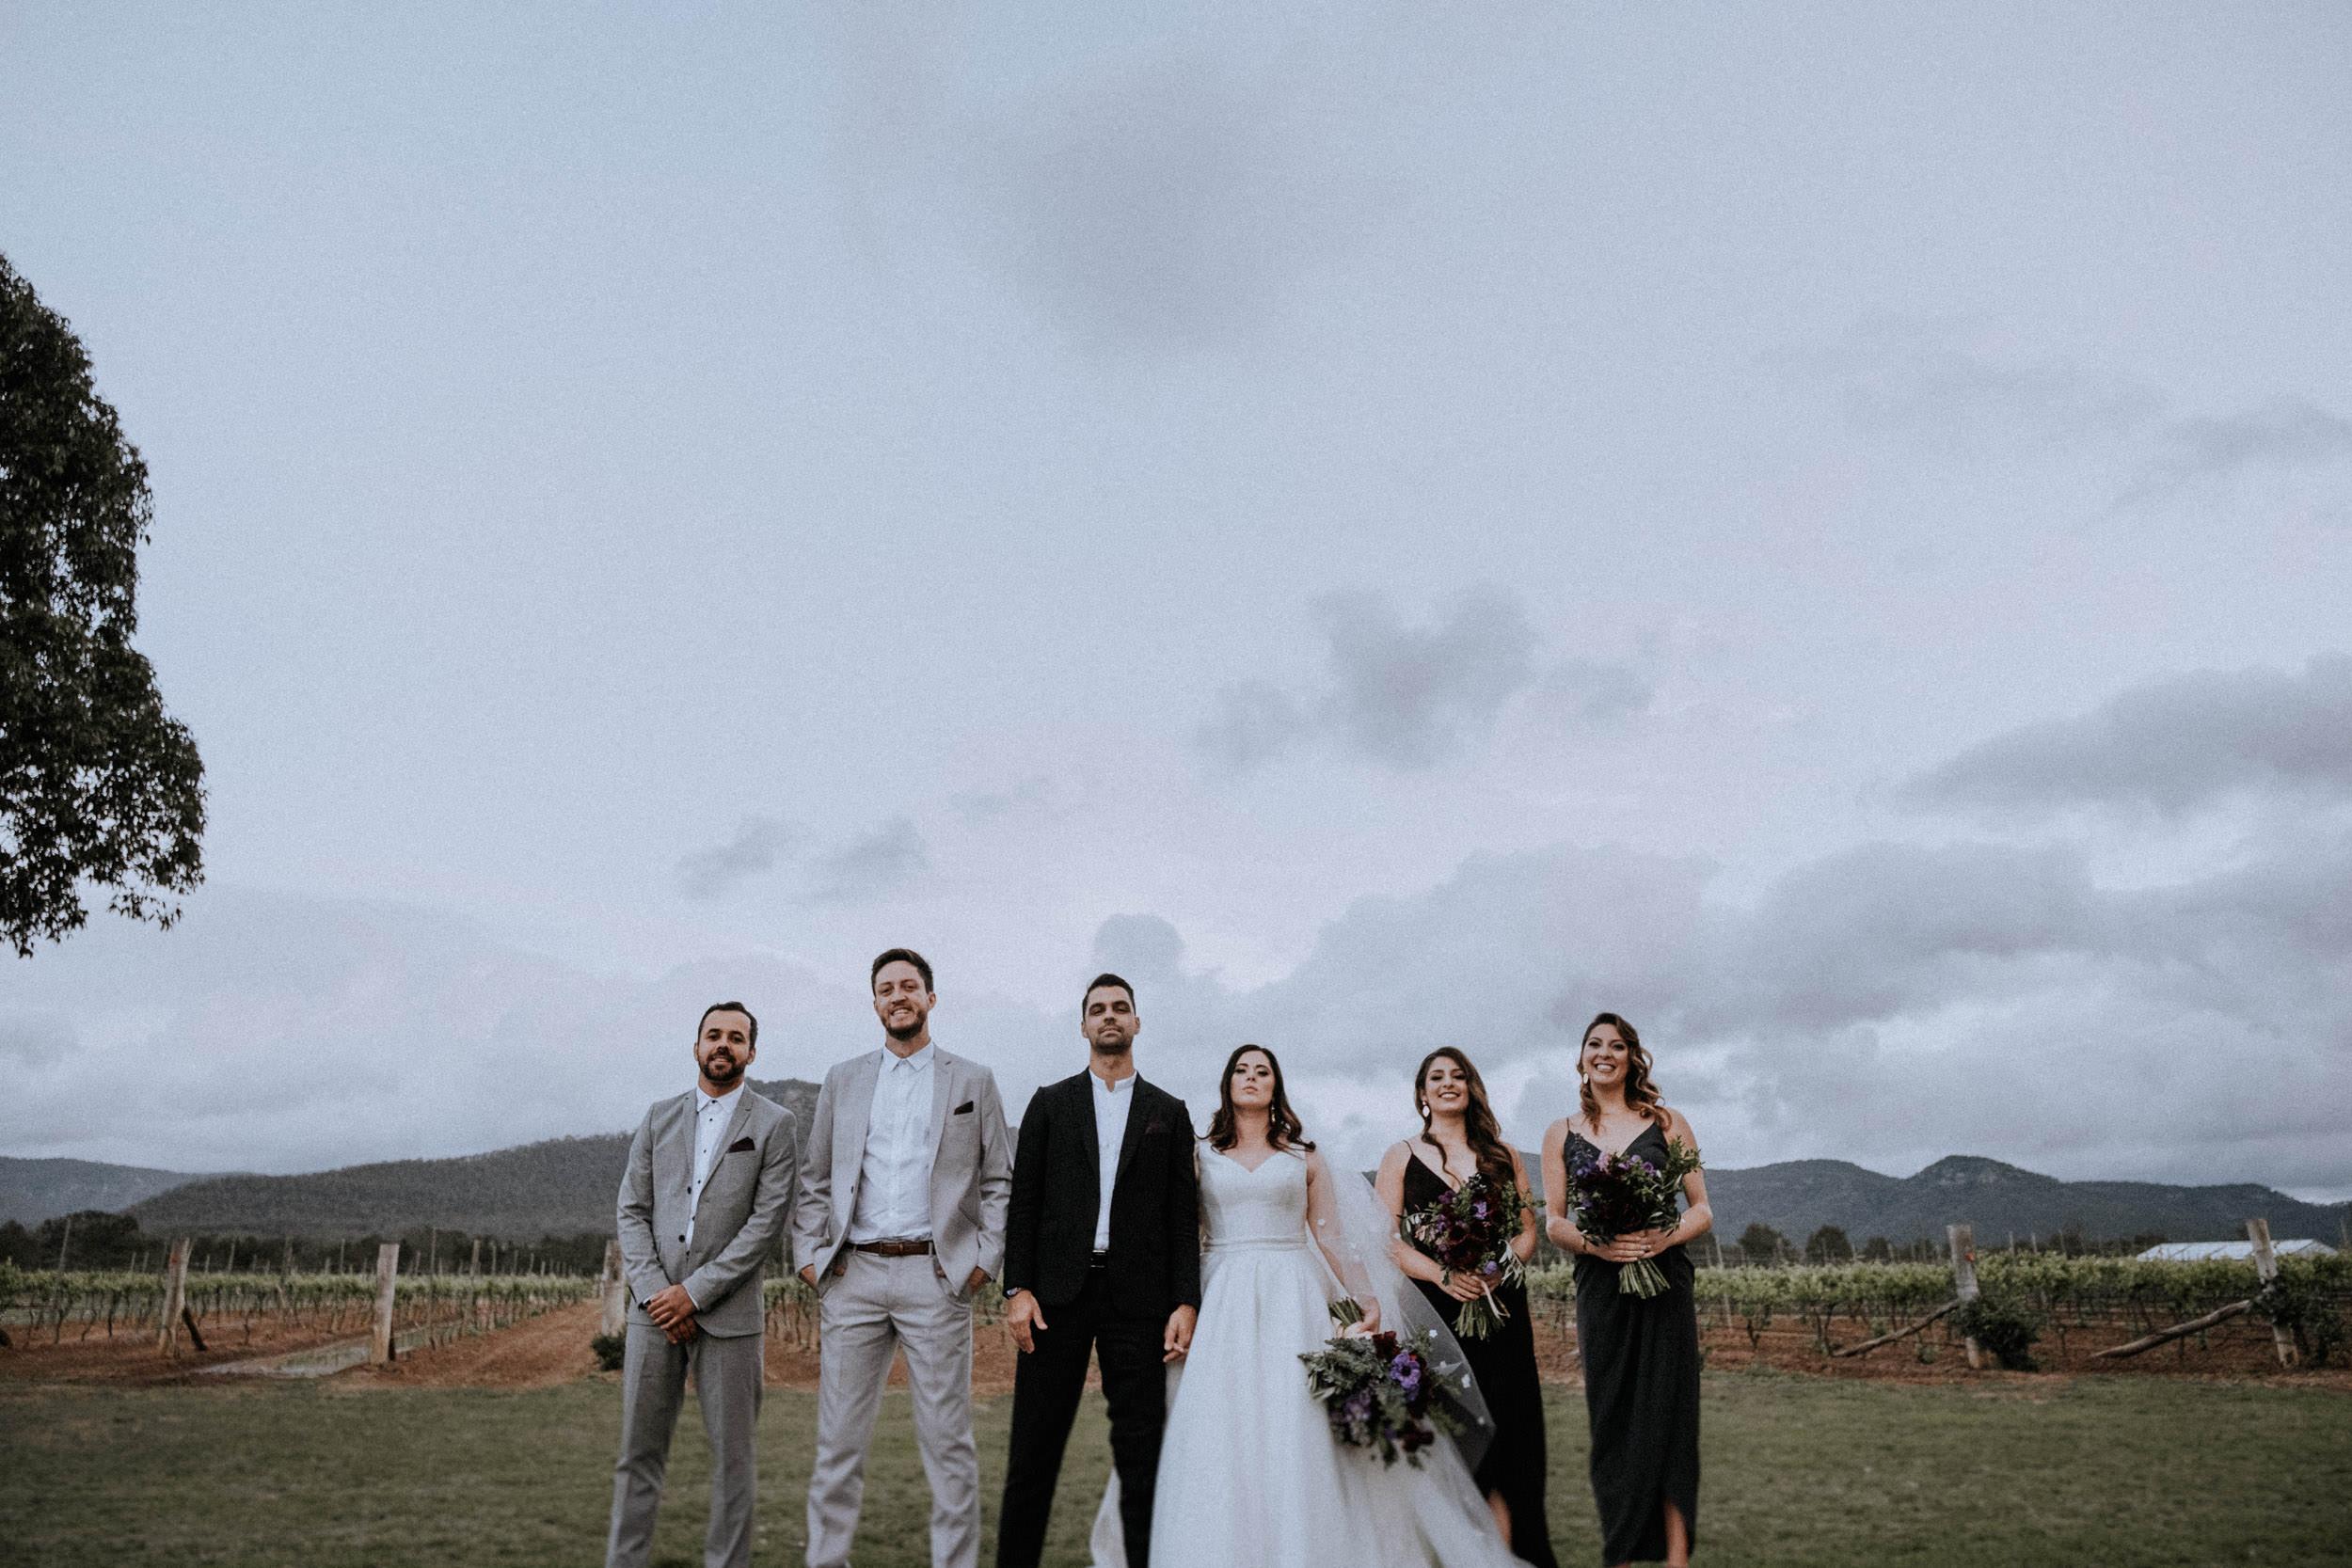 s+j_top_elopement wedding photography_kings & thieves_blog - 454.jpg